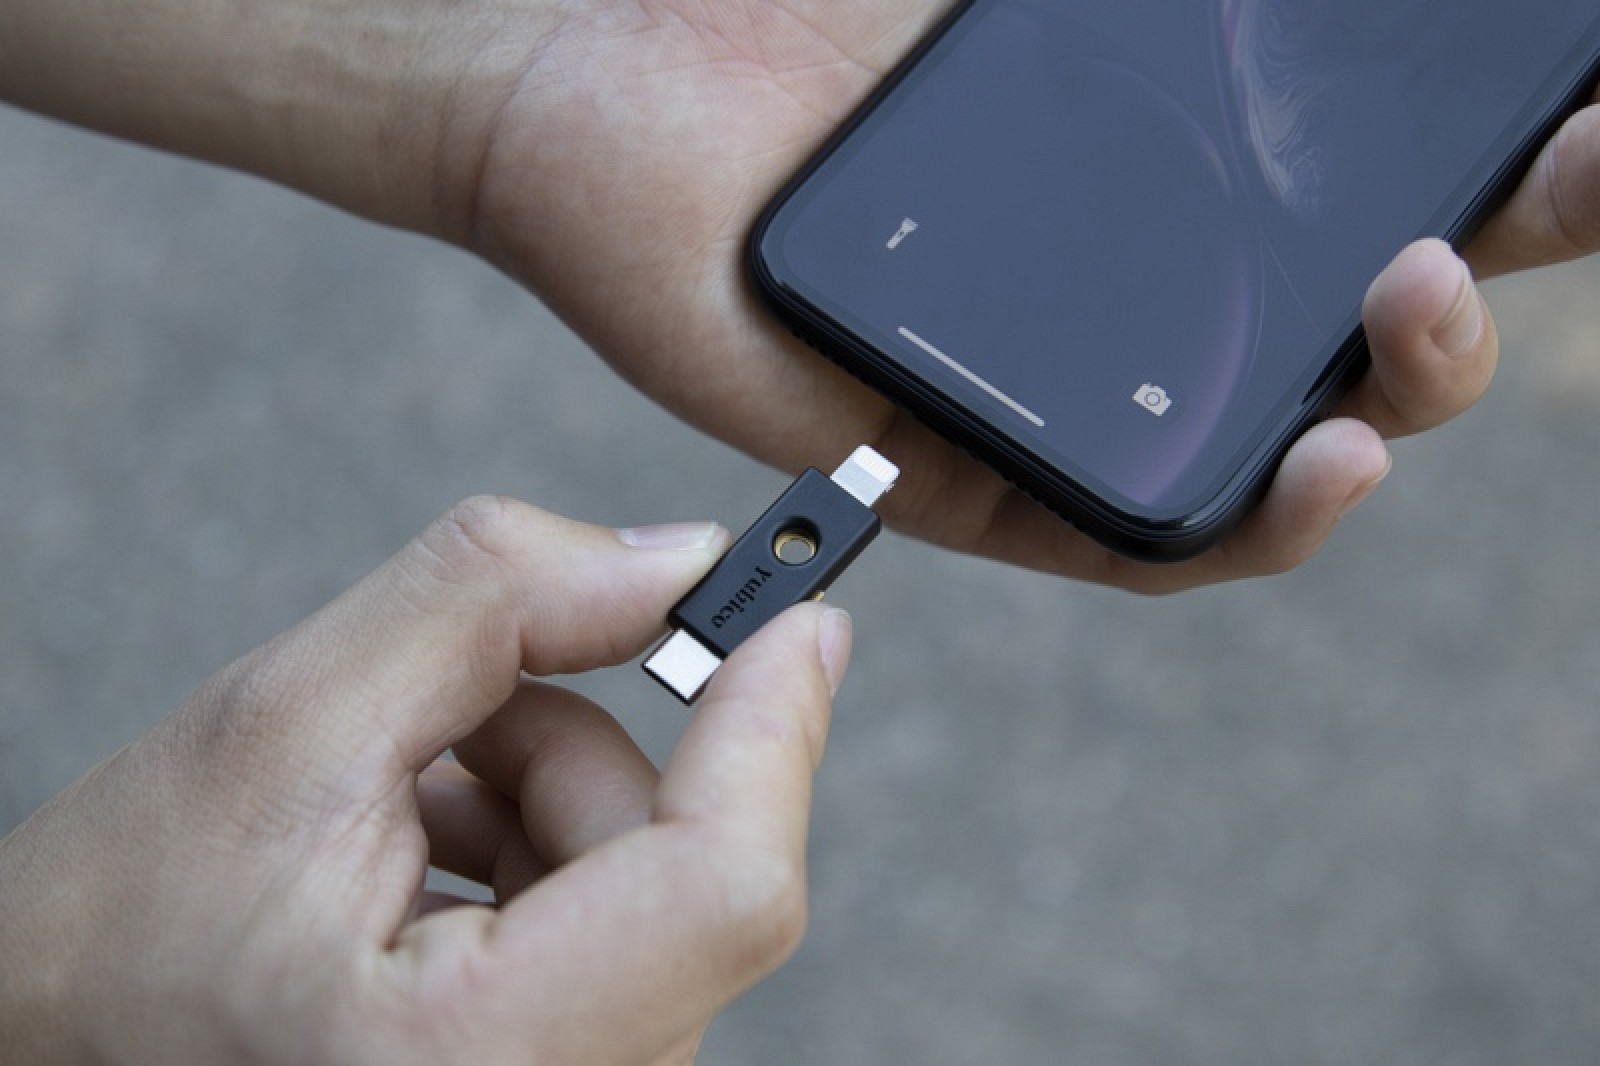 Yubico lanza YubiKey 5Ci equipado con Lightning para la autenticación física segura en dispositivos iOS